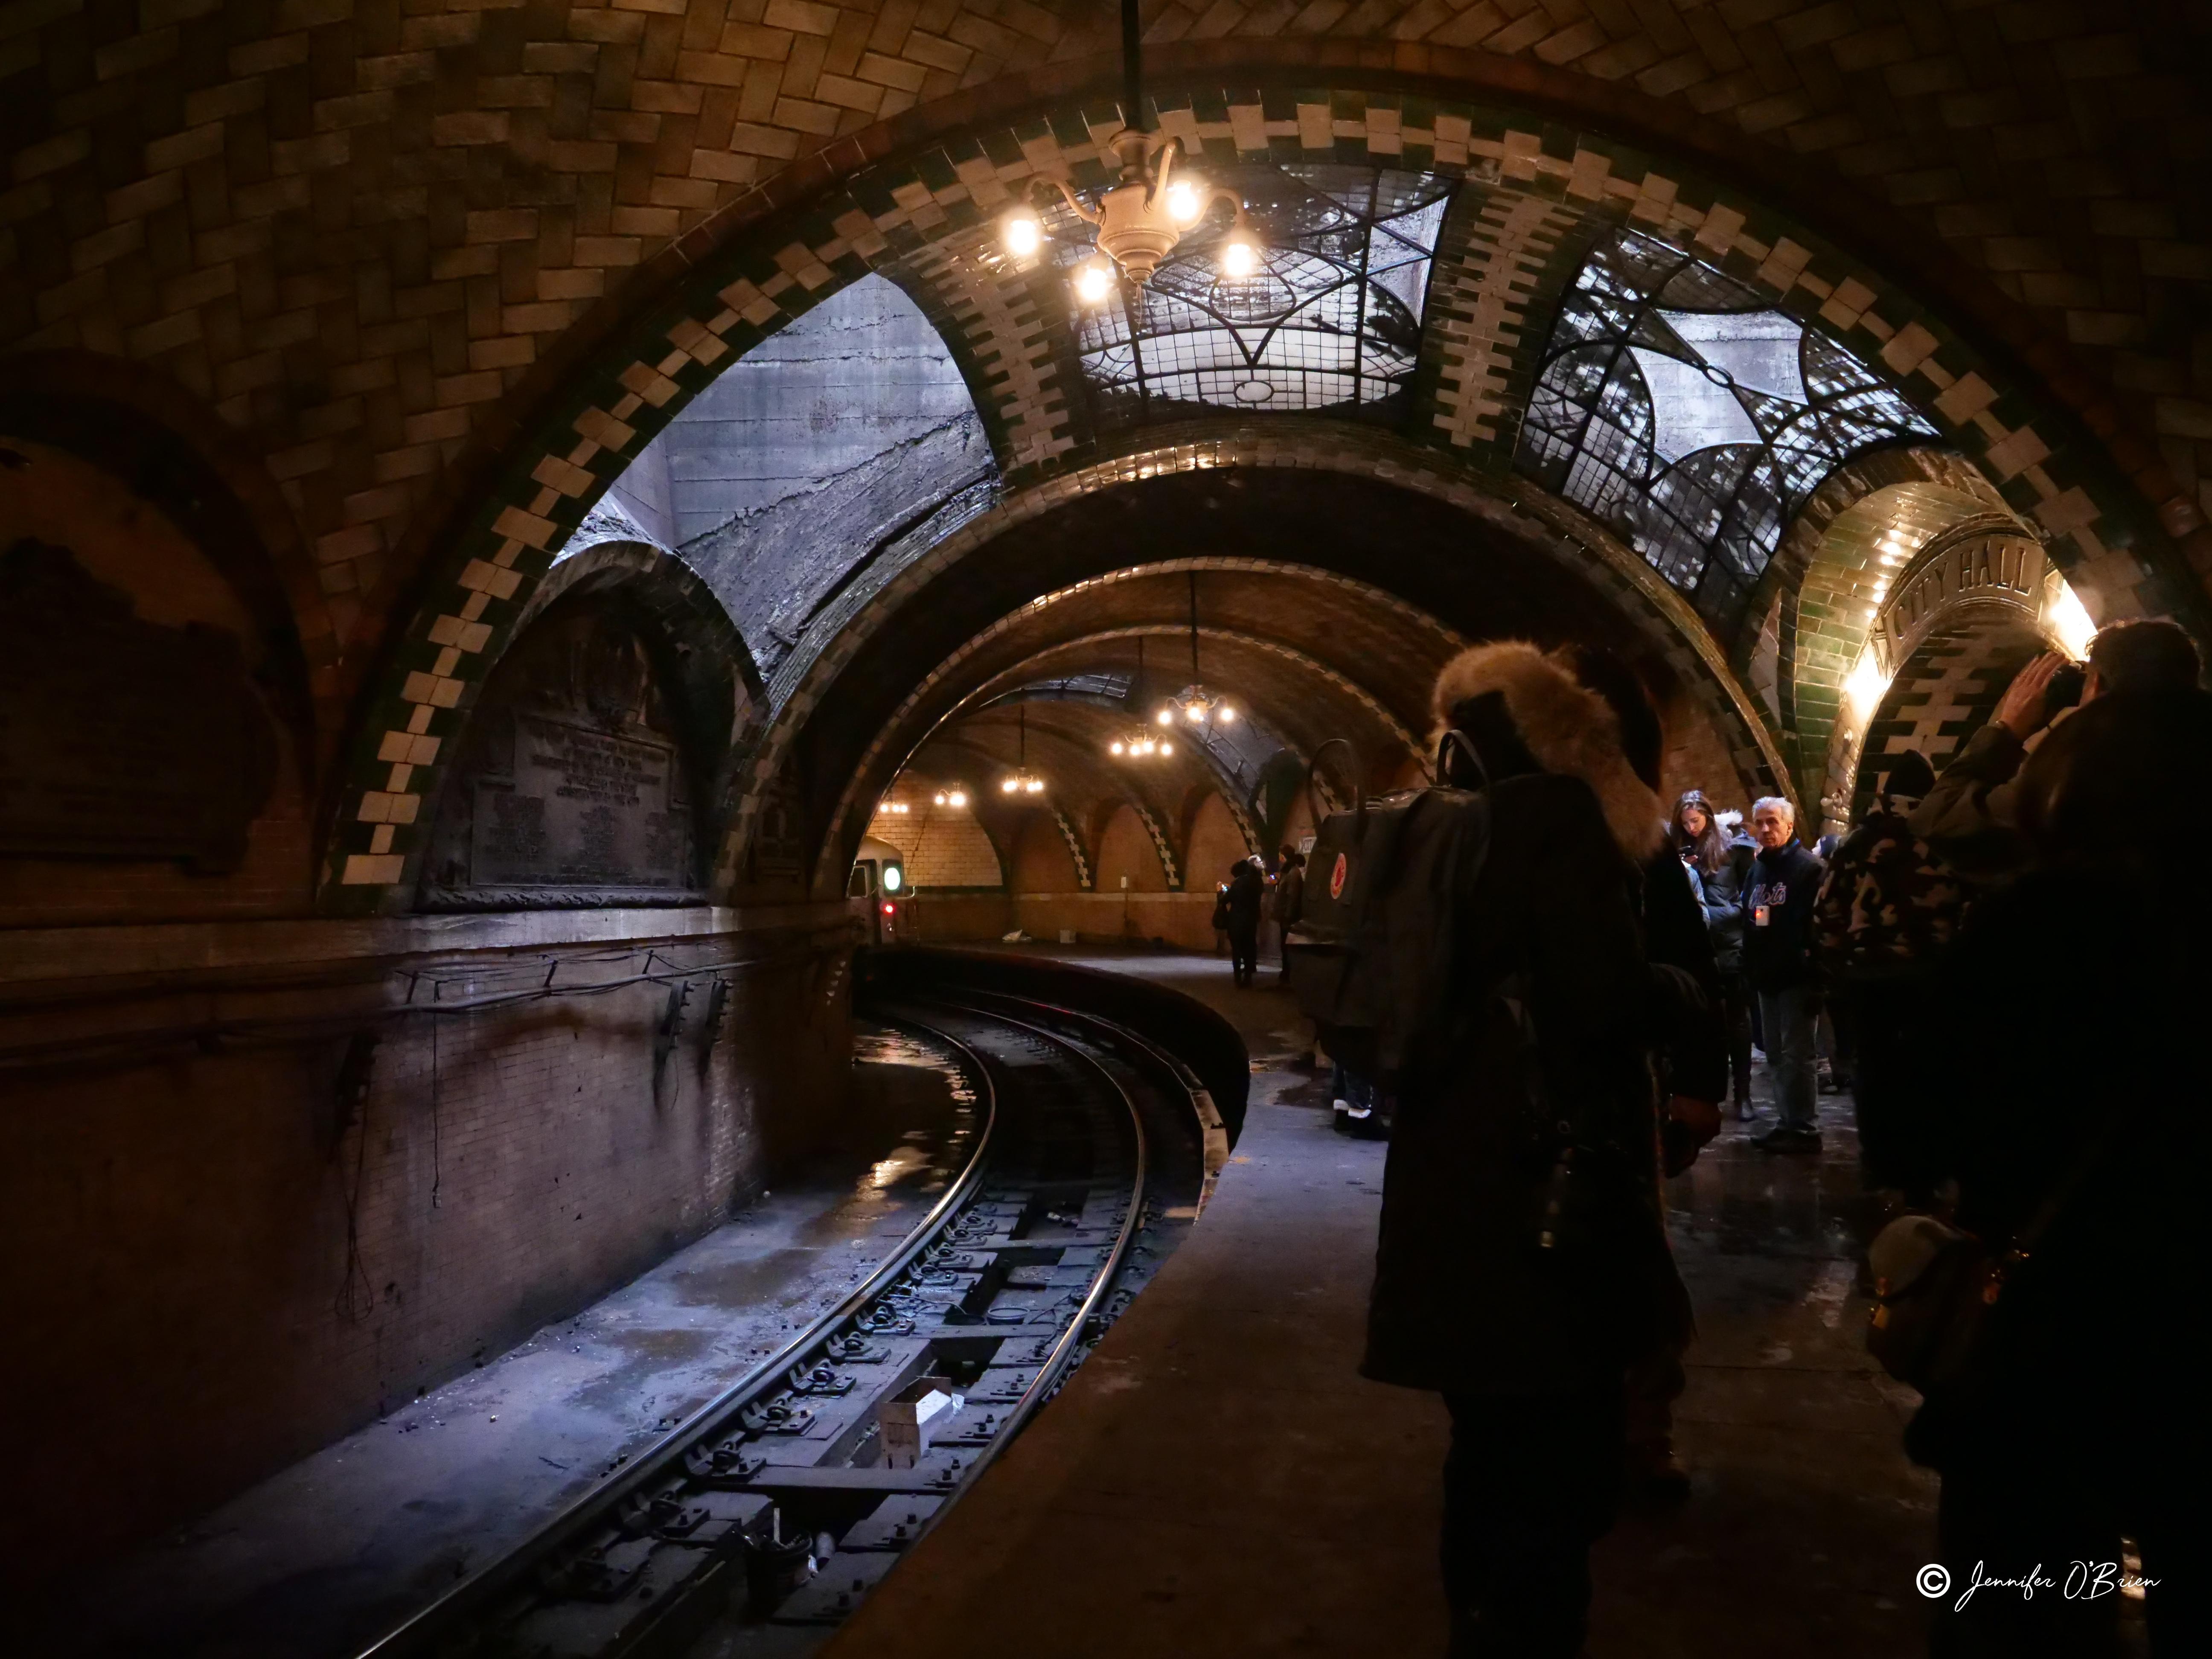 New York Transit Museum Tour NYC Abandoned City Hall Subway Station Photo Challenge